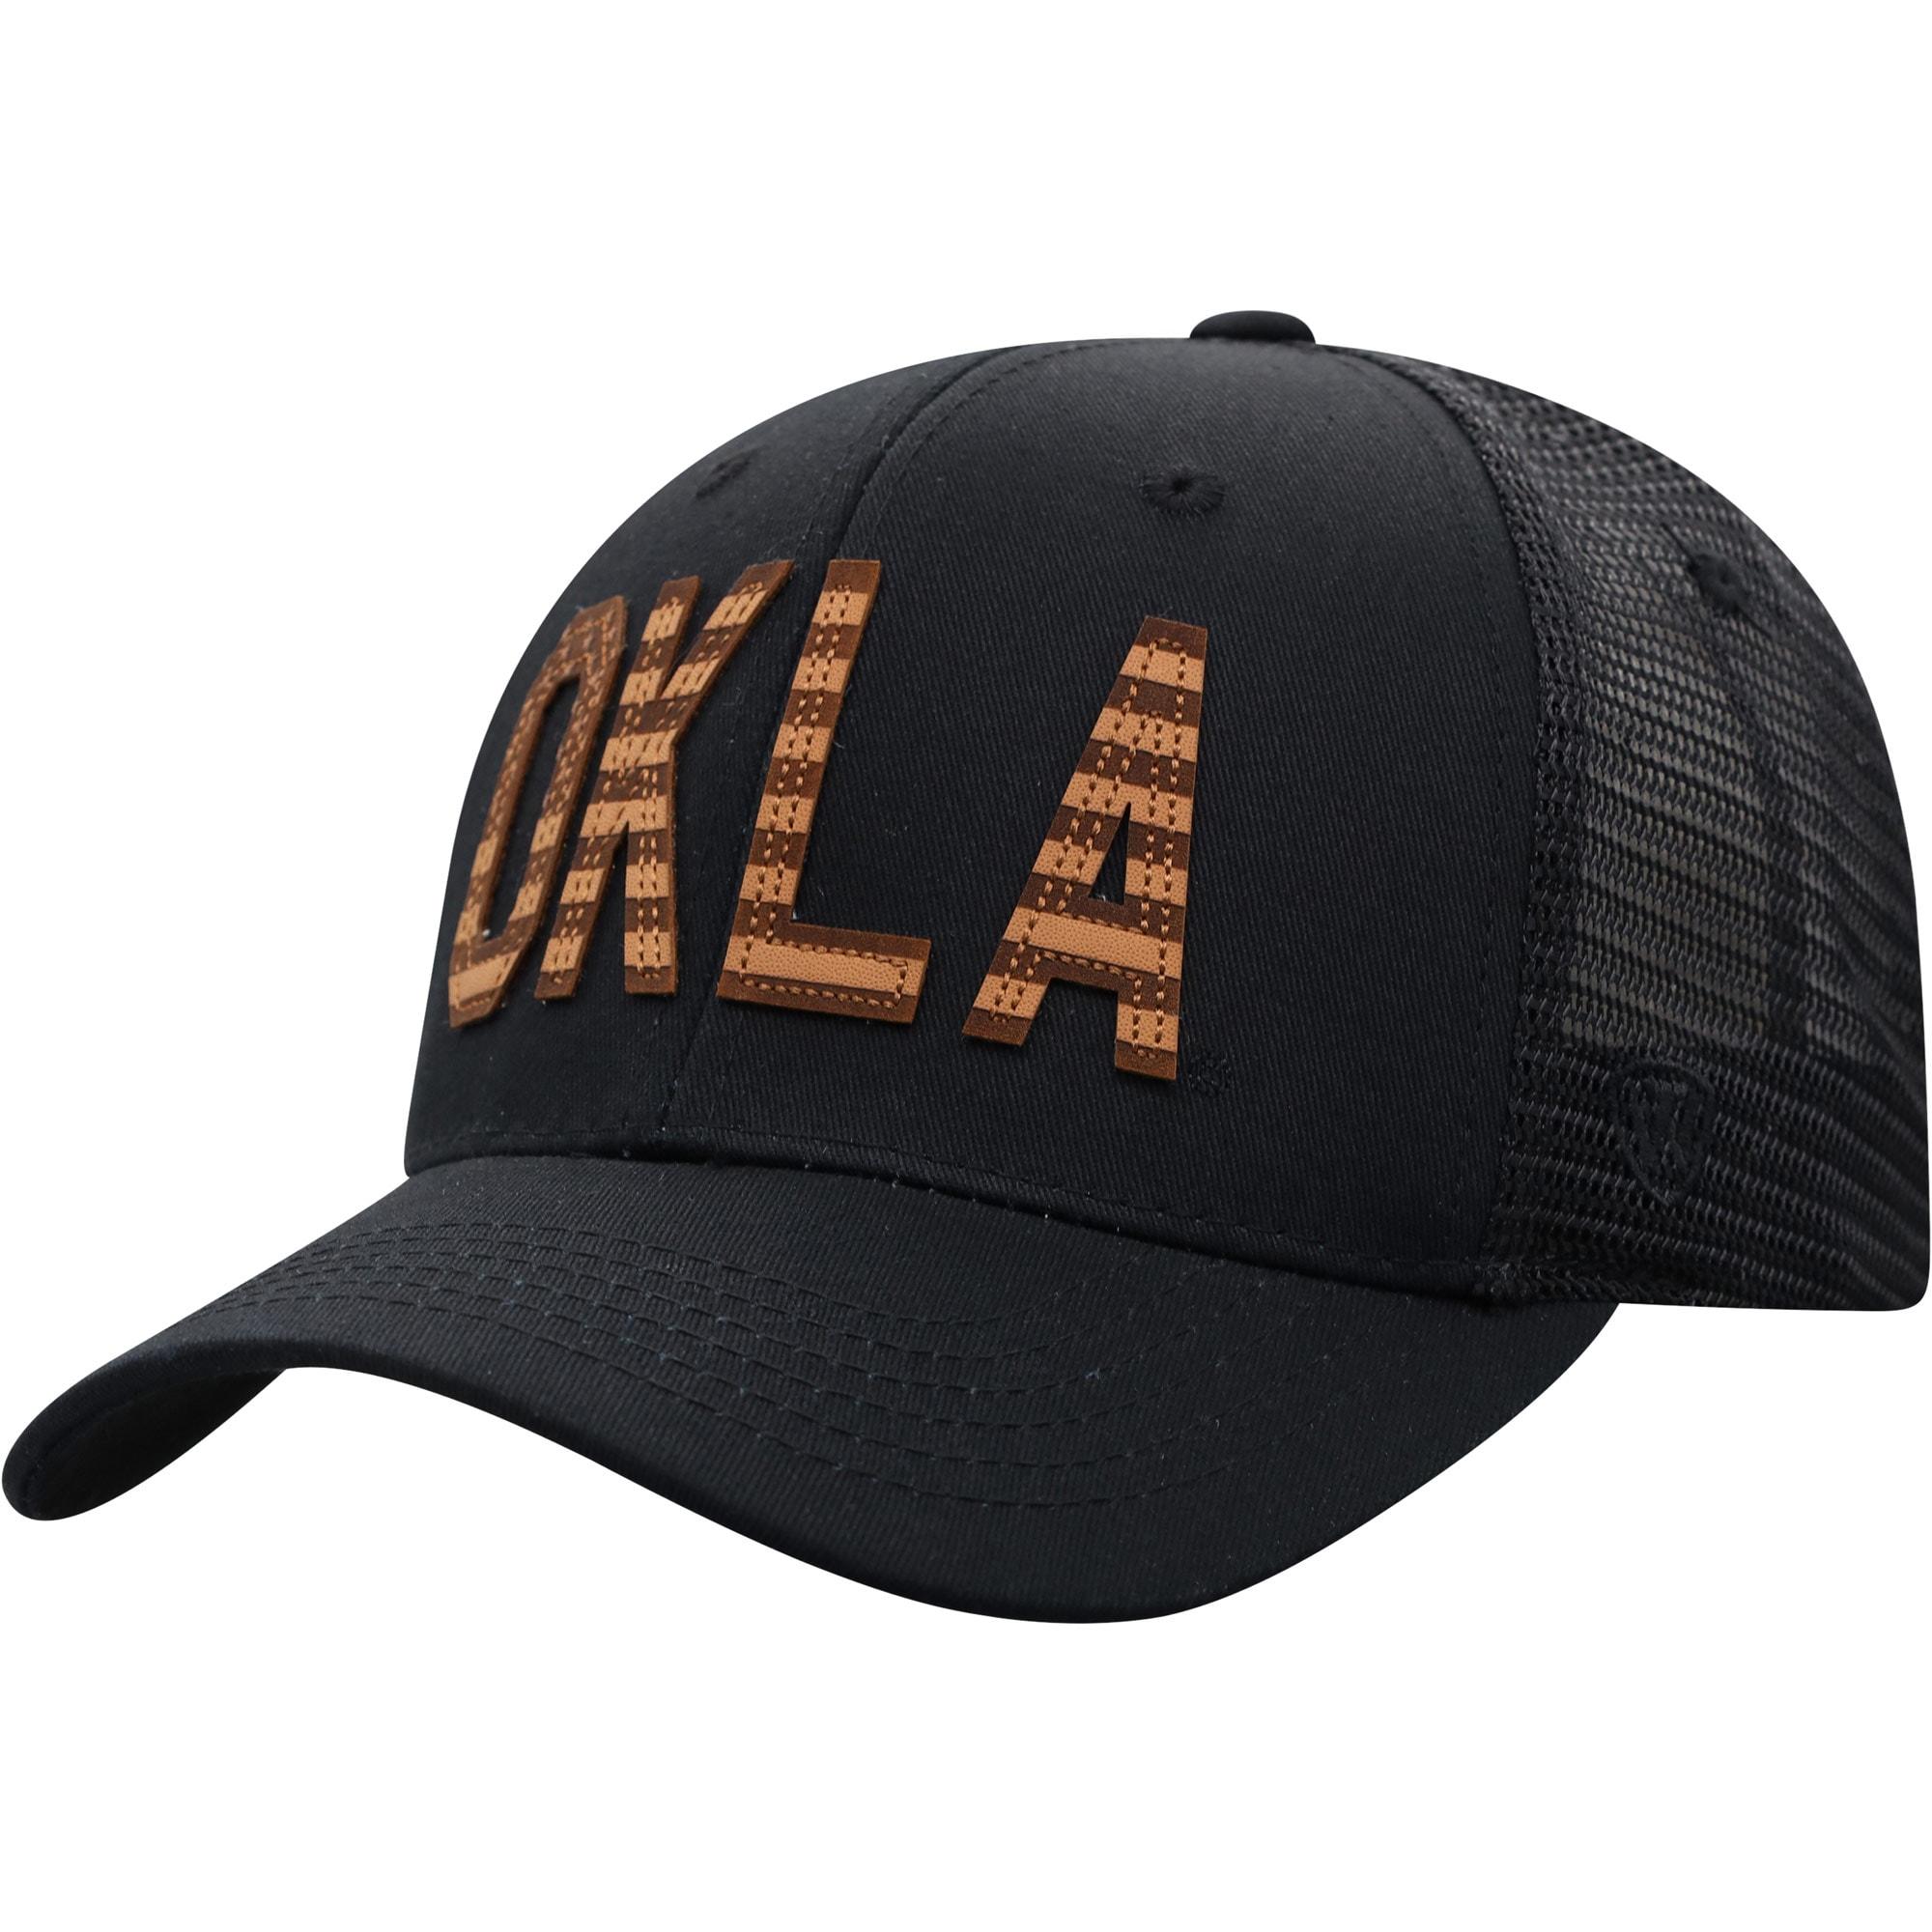 Men's Top of the World Black Oklahoma Sooners Cannon Trucker Snapback Hat